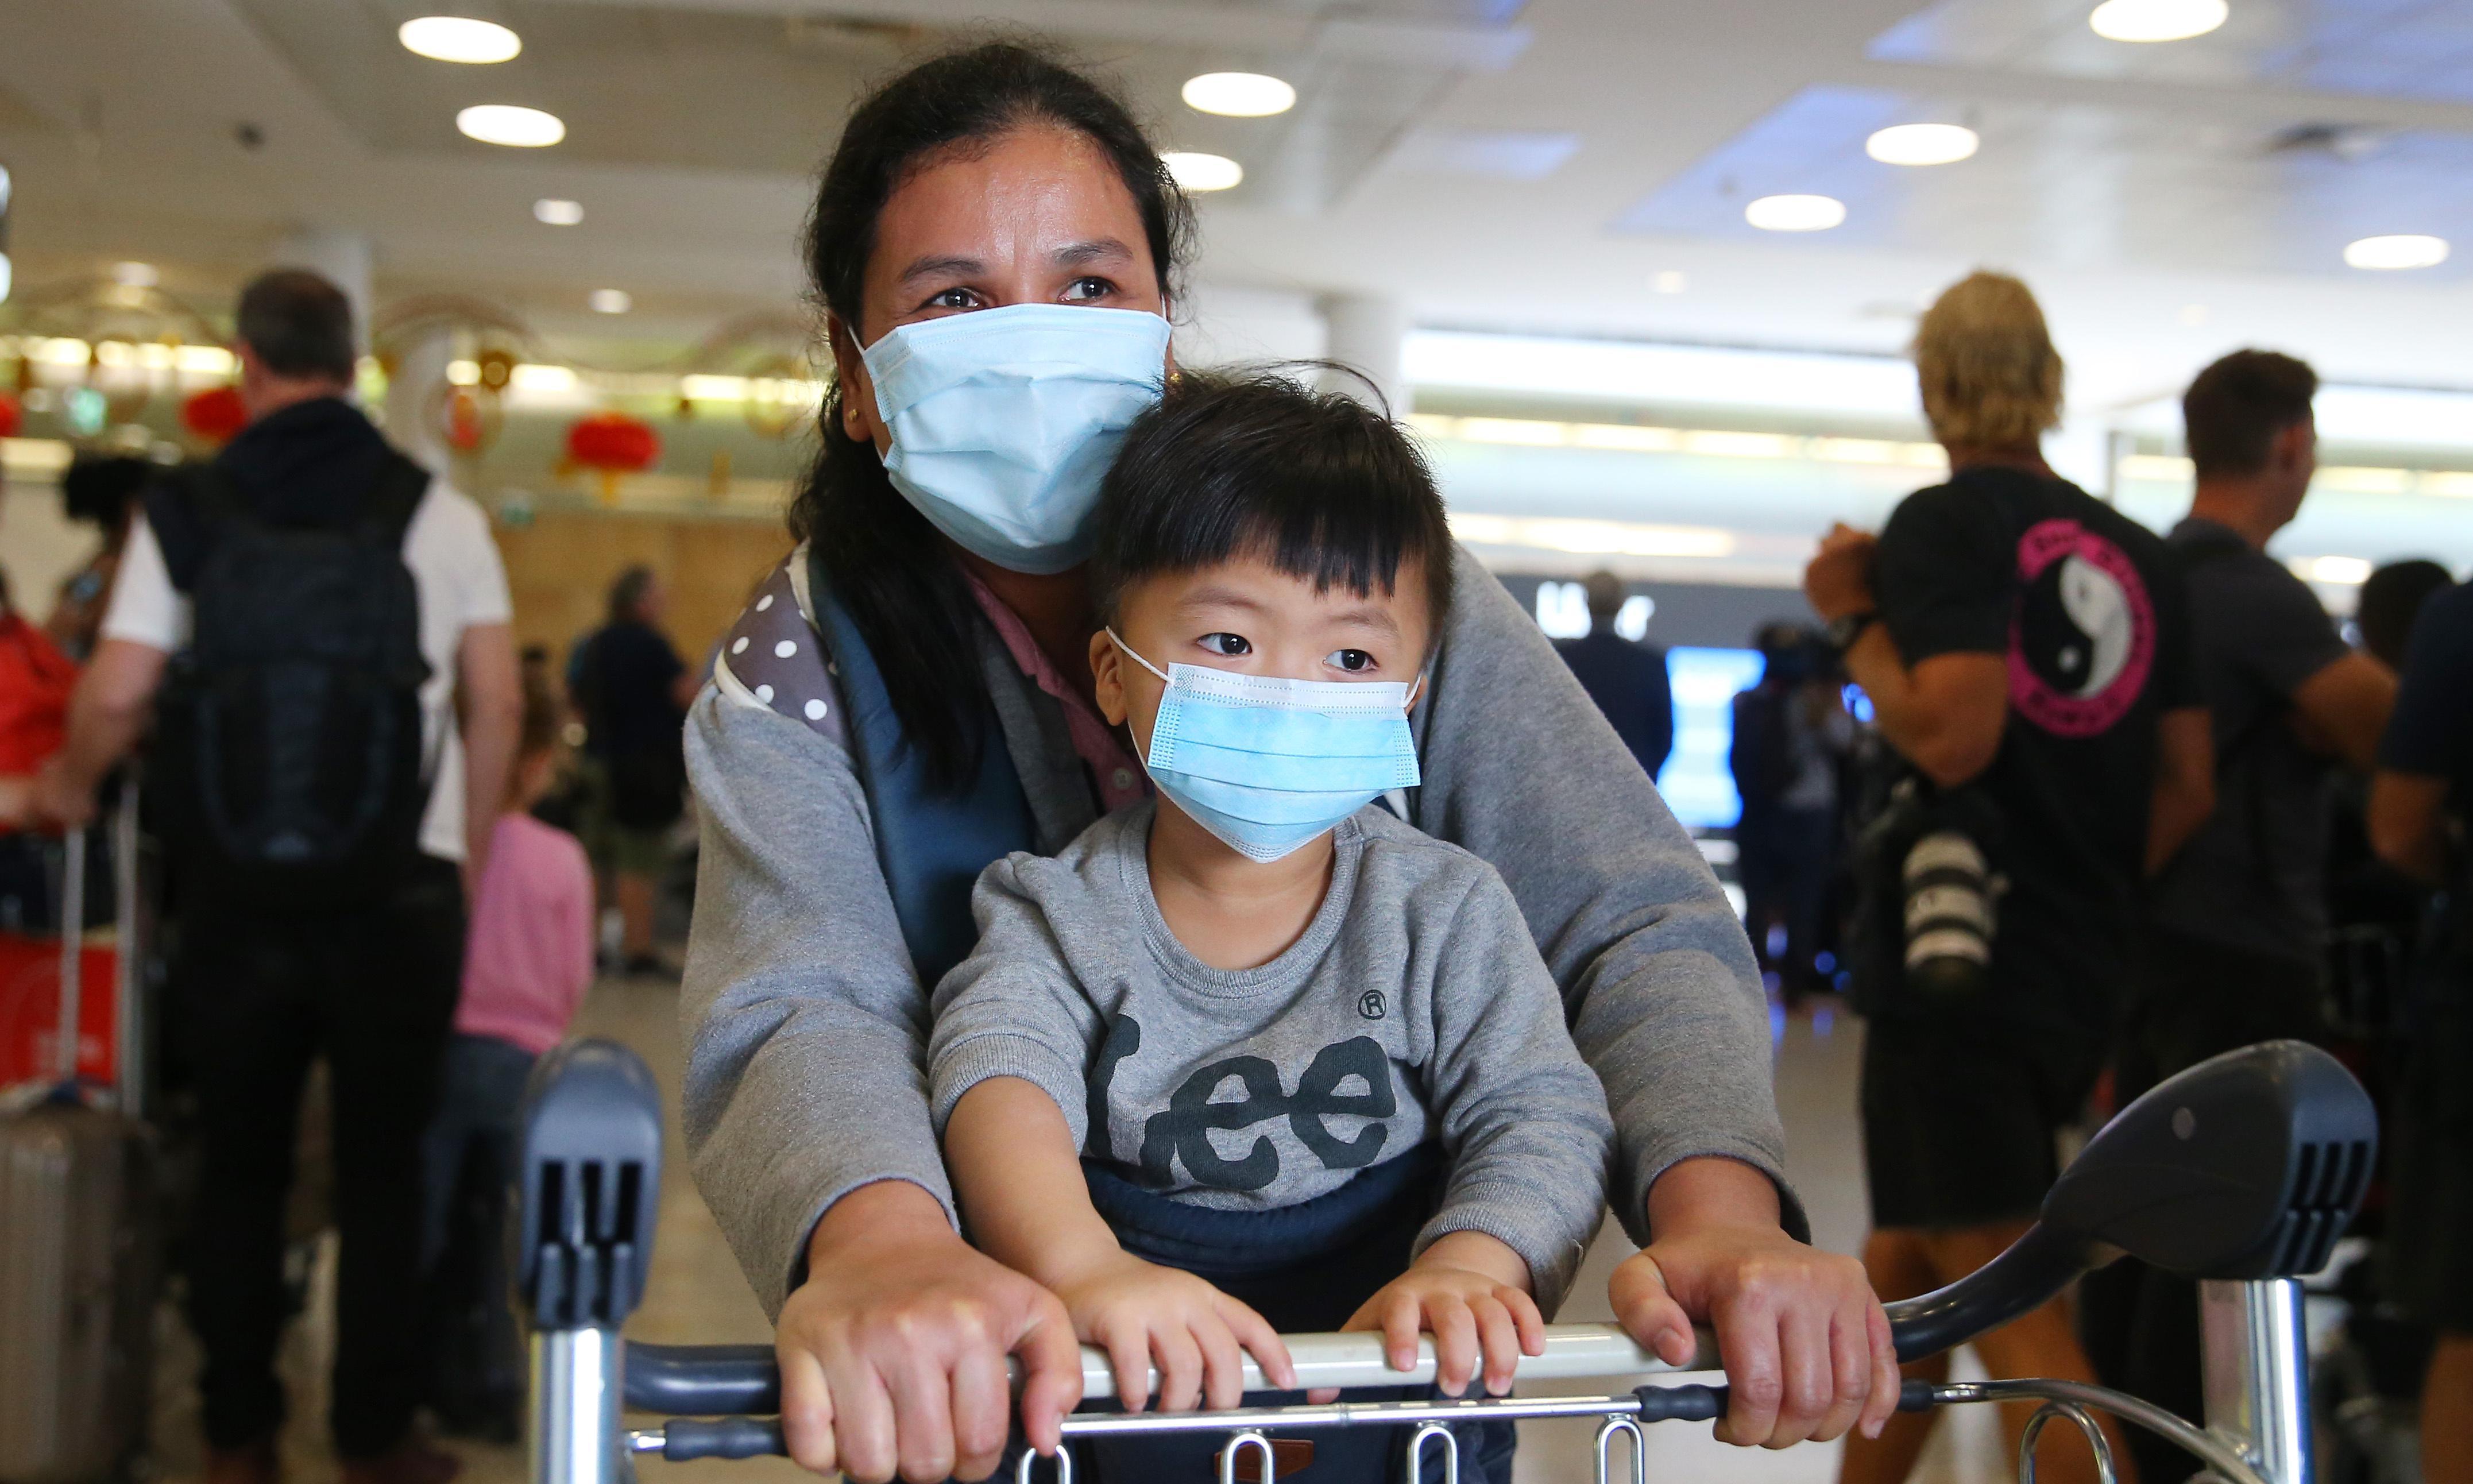 Coronavirus: Australia considers evacuating citizens caught in China amid lockdown